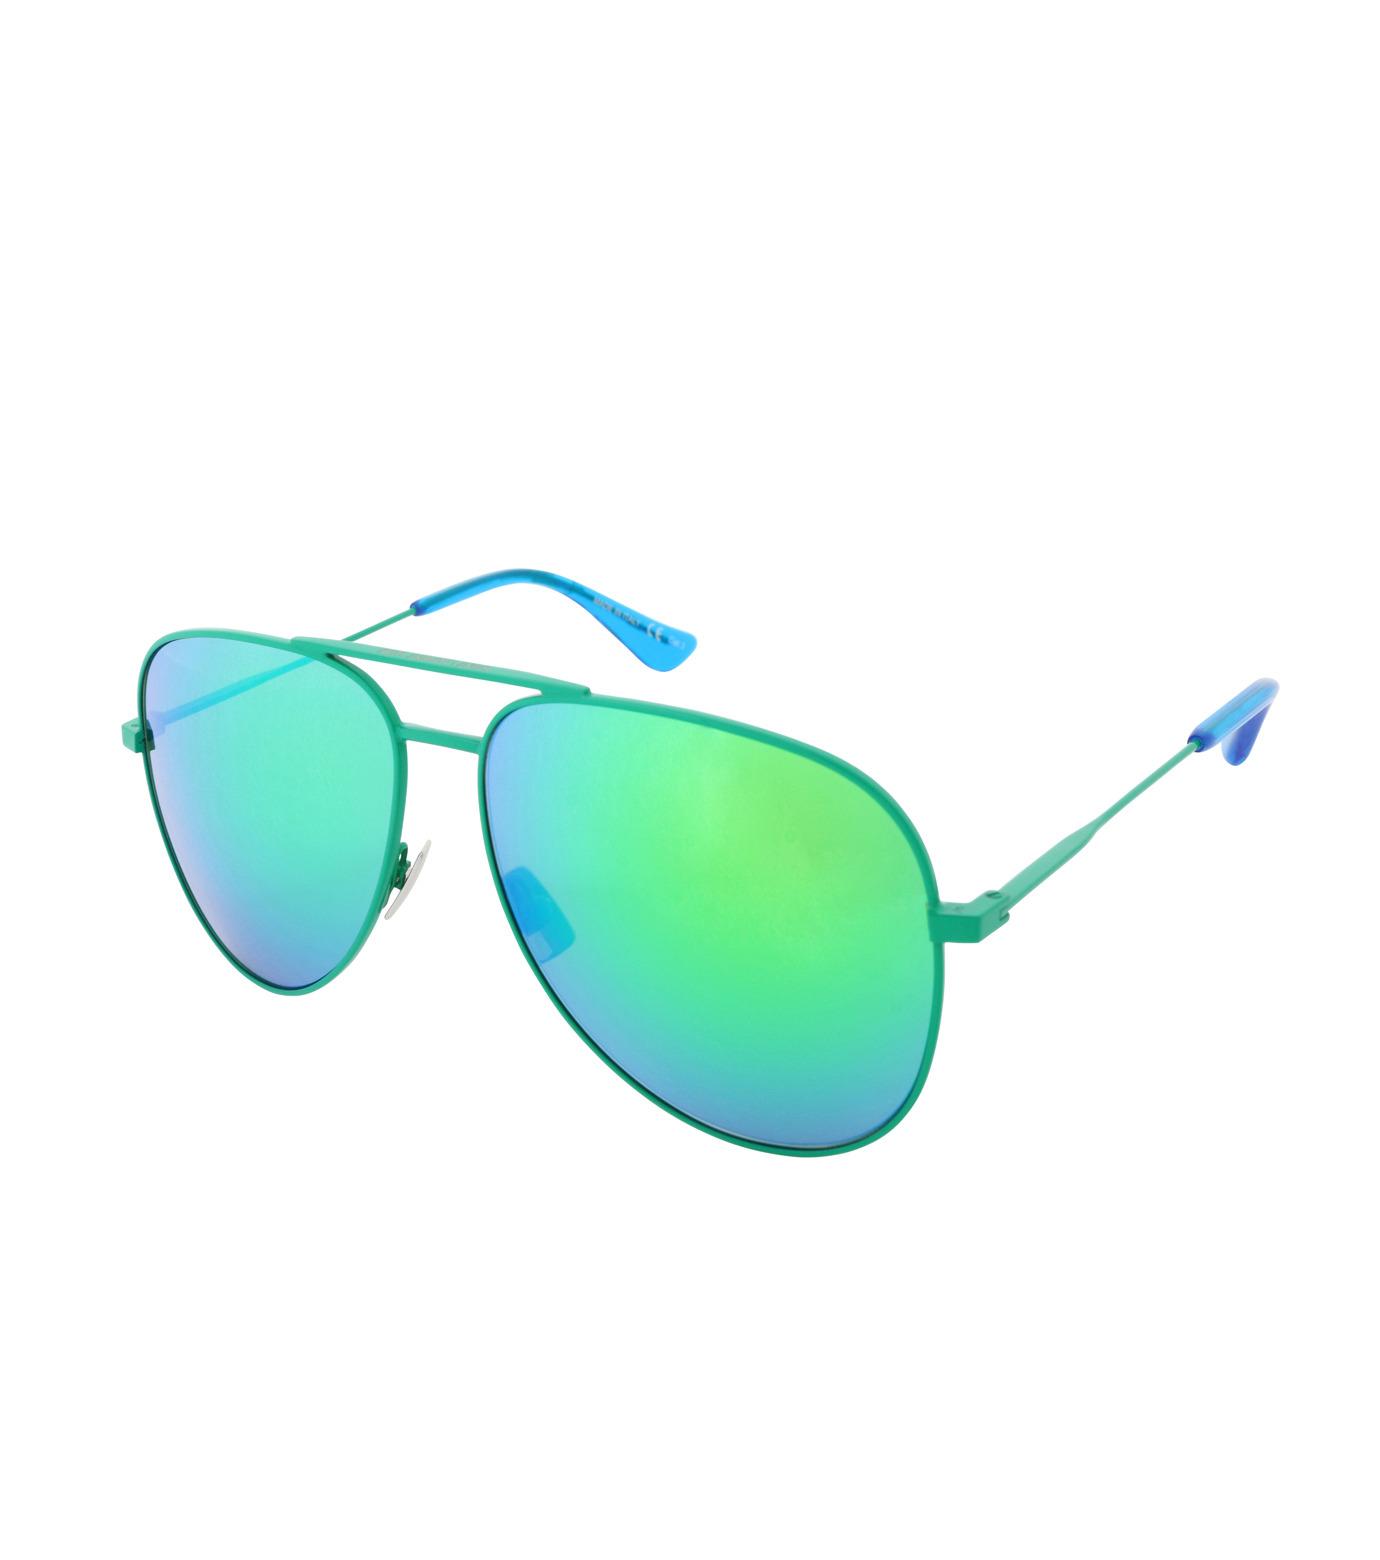 SAINT LAURENT(サンローラン)のTeardrop-GREEN(アイウェア/eyewear)-427758-Y9902-22 拡大詳細画像1